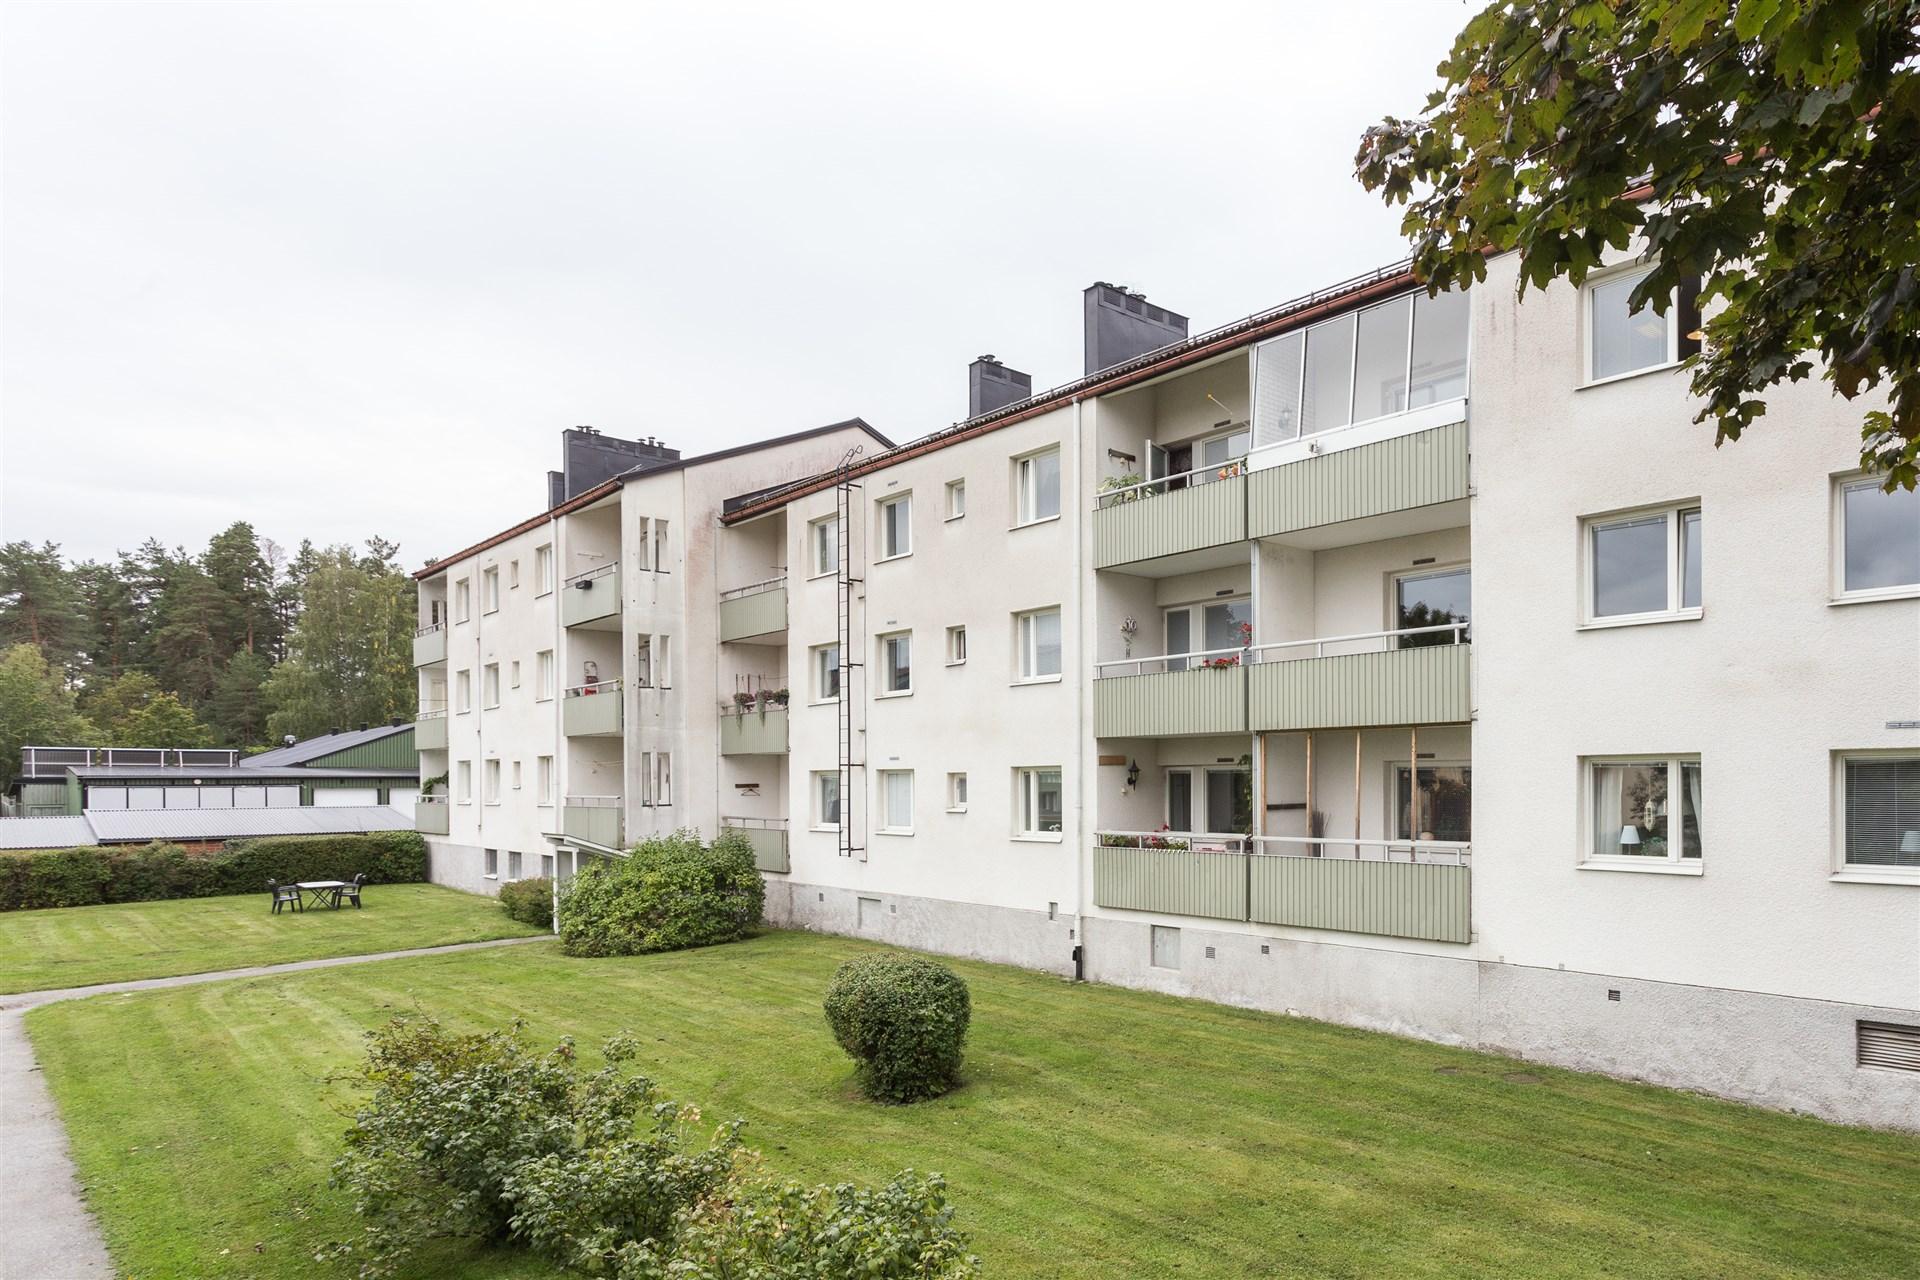 Trevlig lägenhet med 2 rum på bottenvåningen. Balkong mot baksidan med fin innergård.